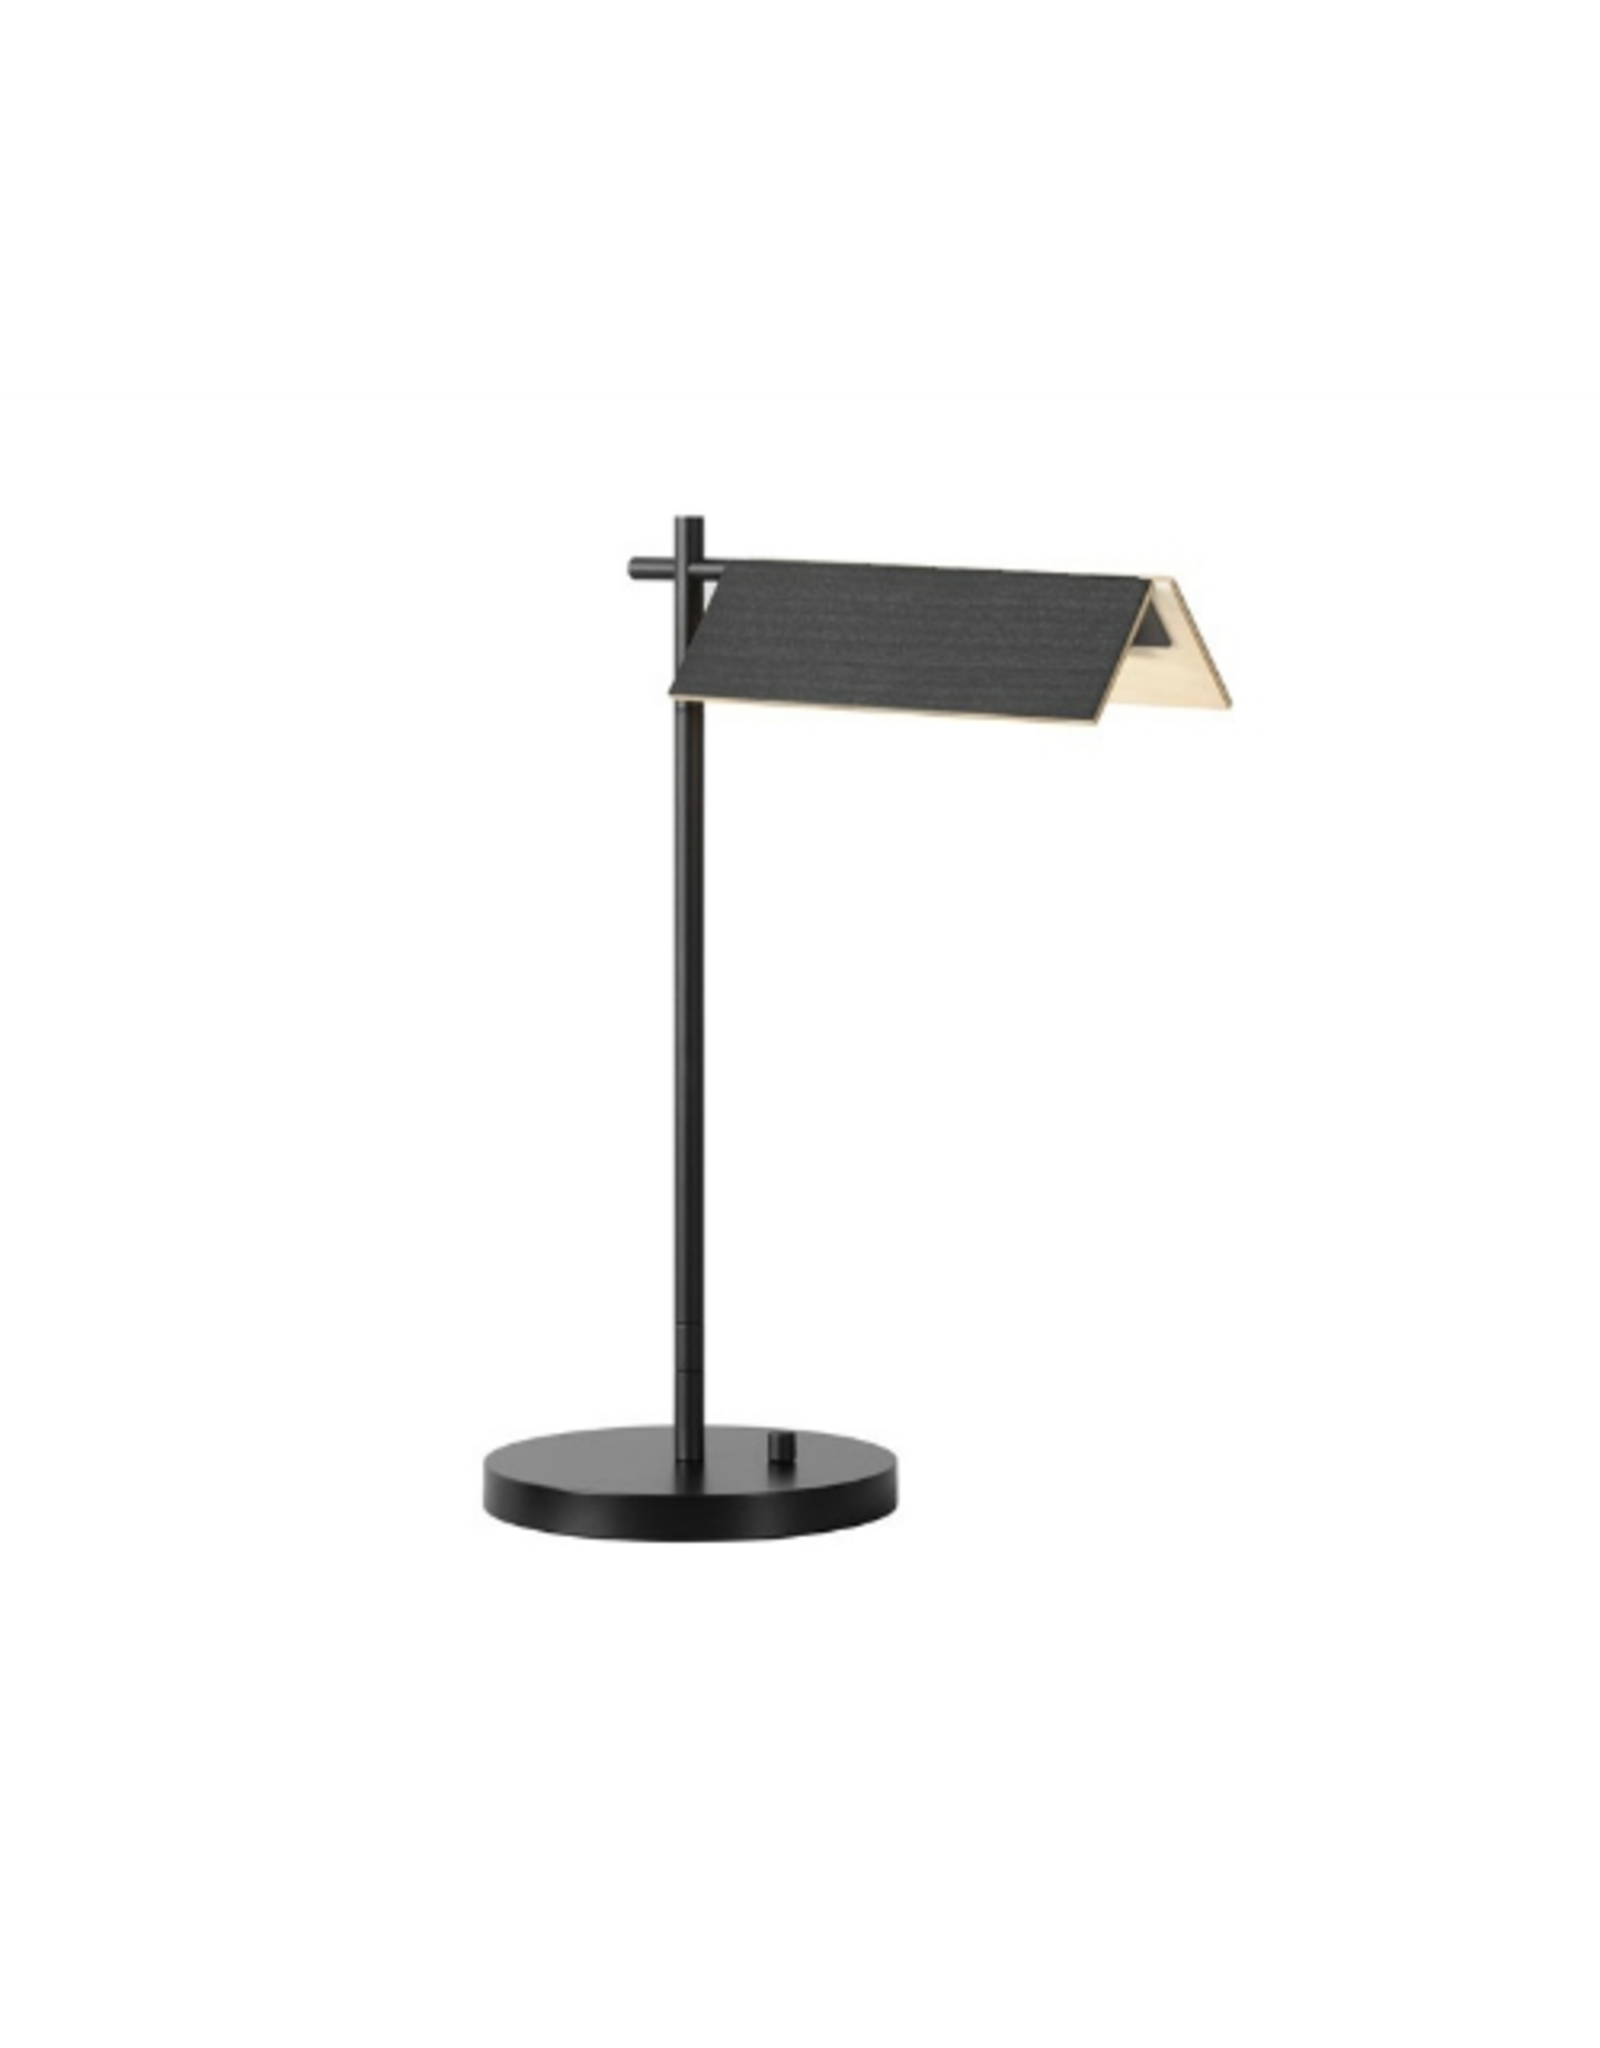 ATELJE LYKTAN SVIT TABLE LAMP